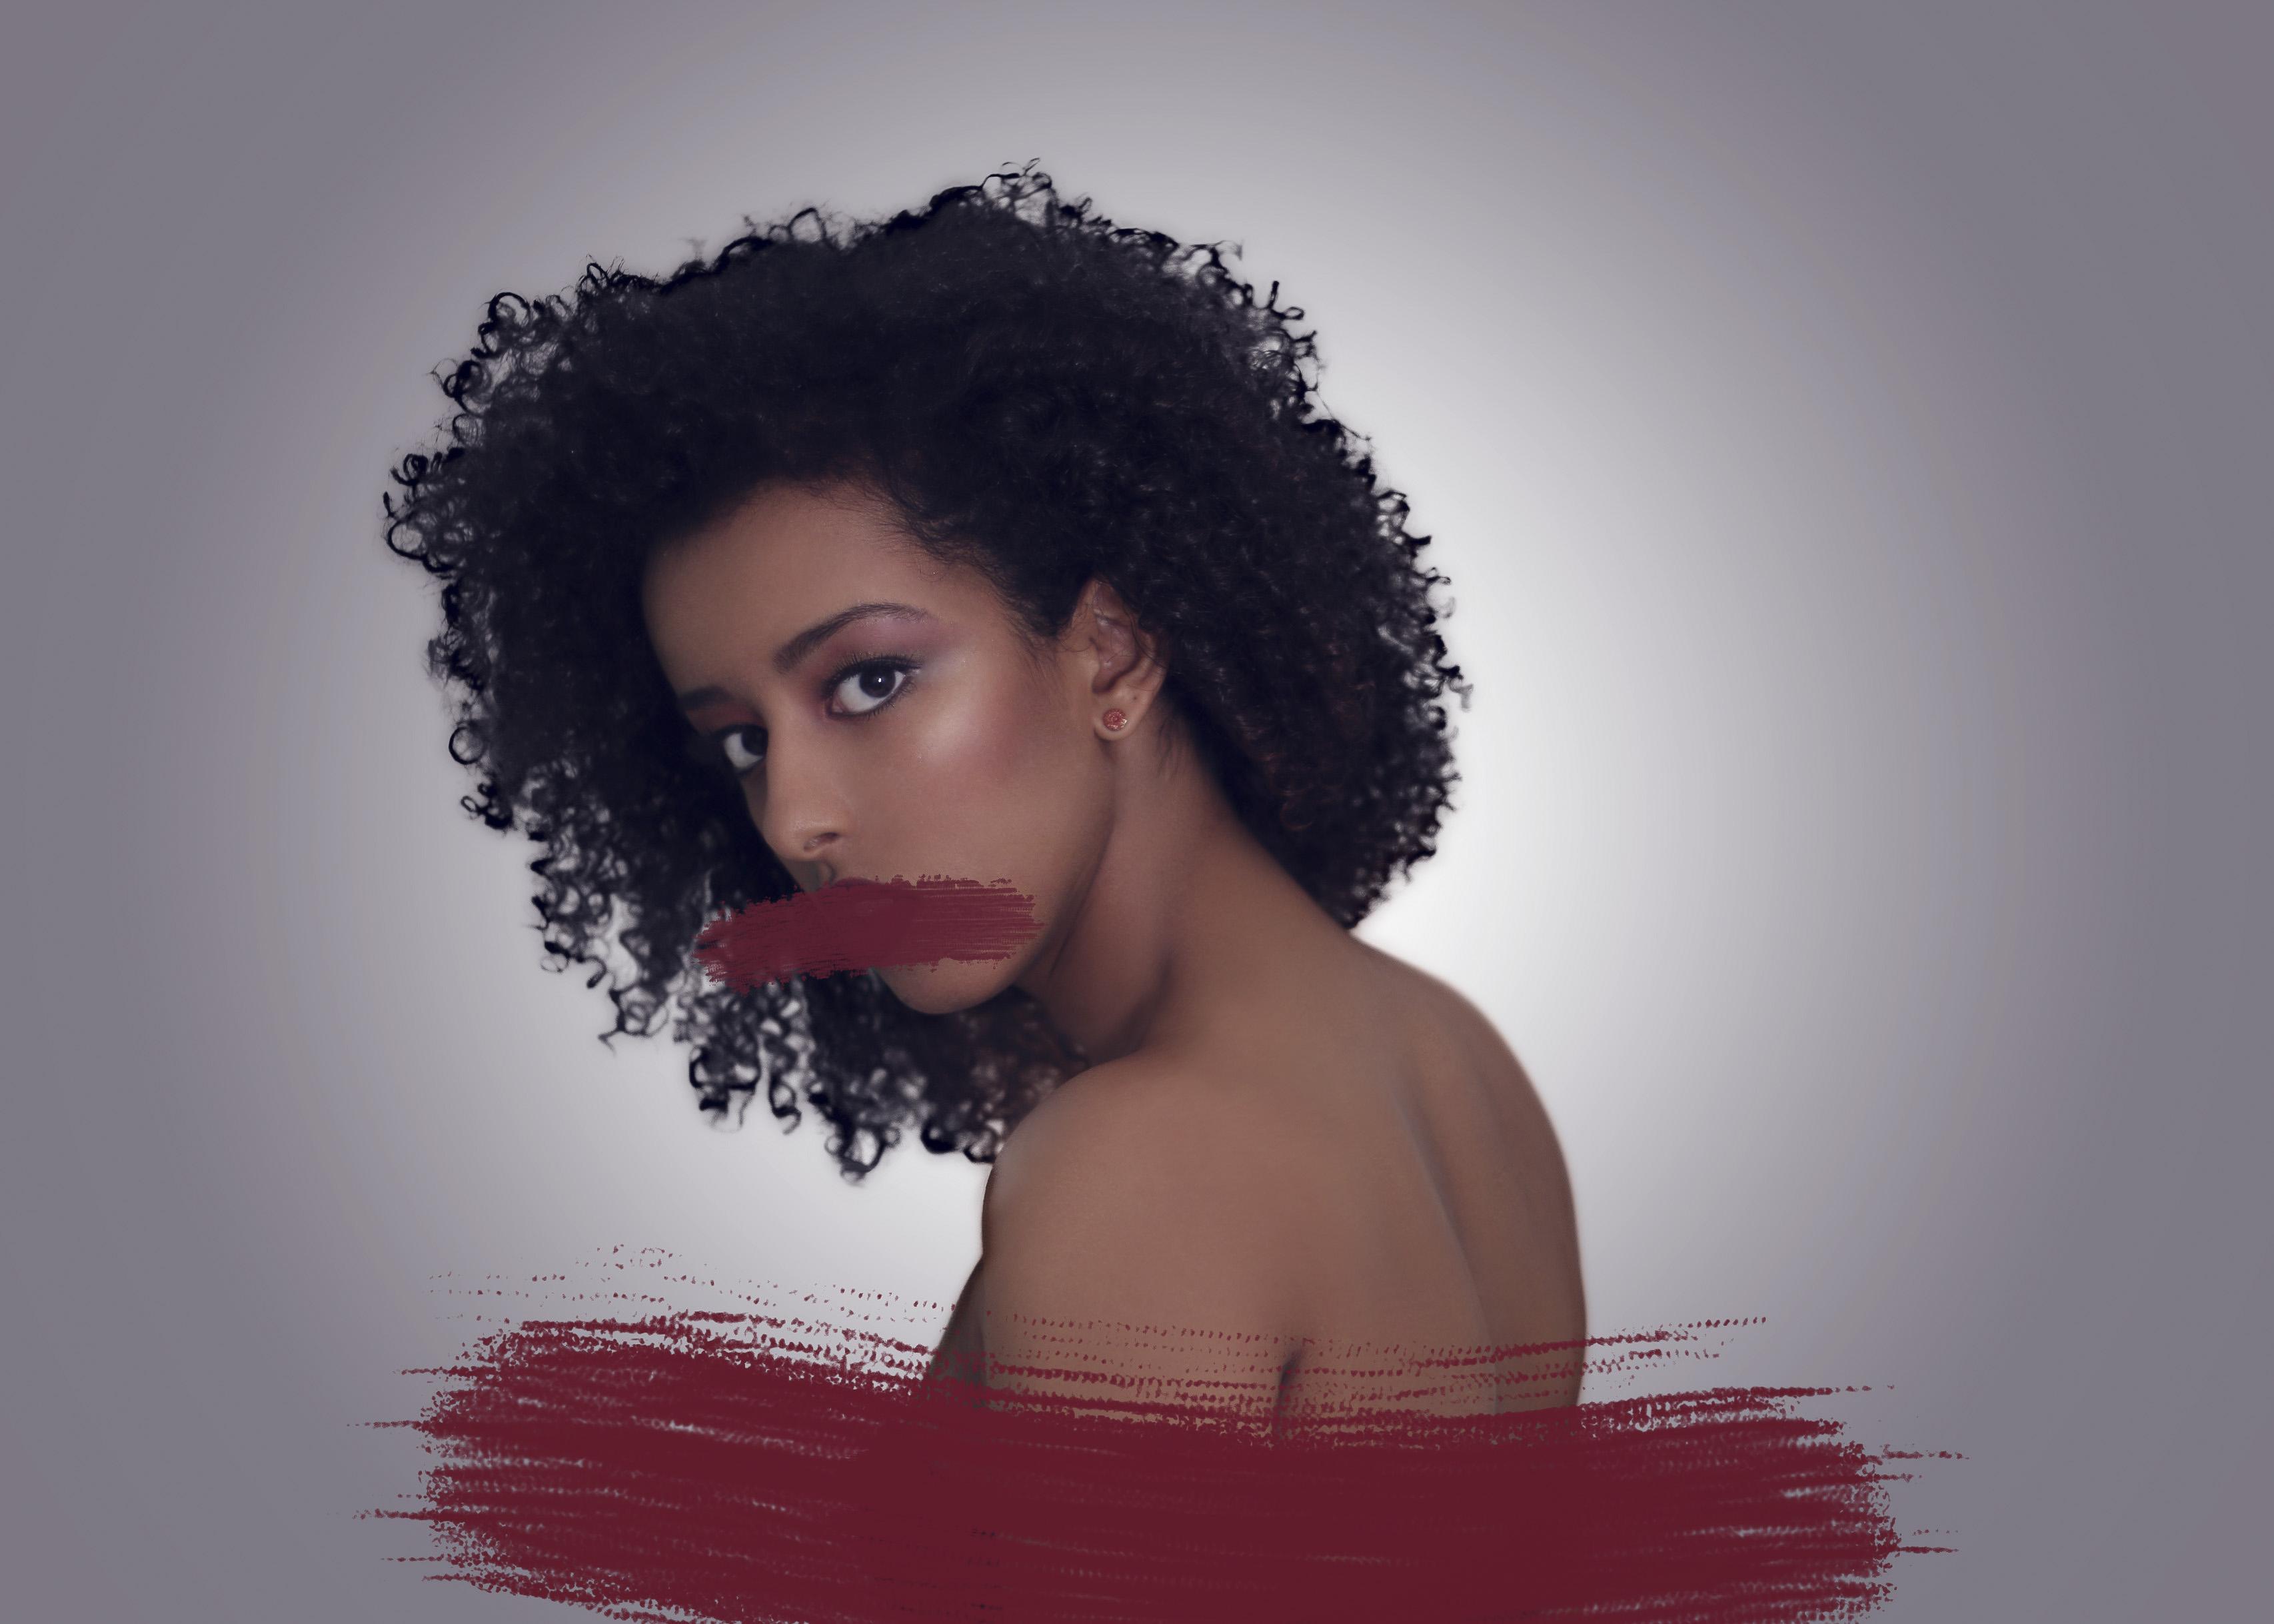 Wallpaper Model Long Hair Red Surreal Black Hair Afro Conceptual Girl Beauty Lip Surrealism Naturalhair Hairstyle Photo Shoot Brown Hair Human Hair Color Hair Coloring 52weeks Curlyhair Conceptualism 3412x2437